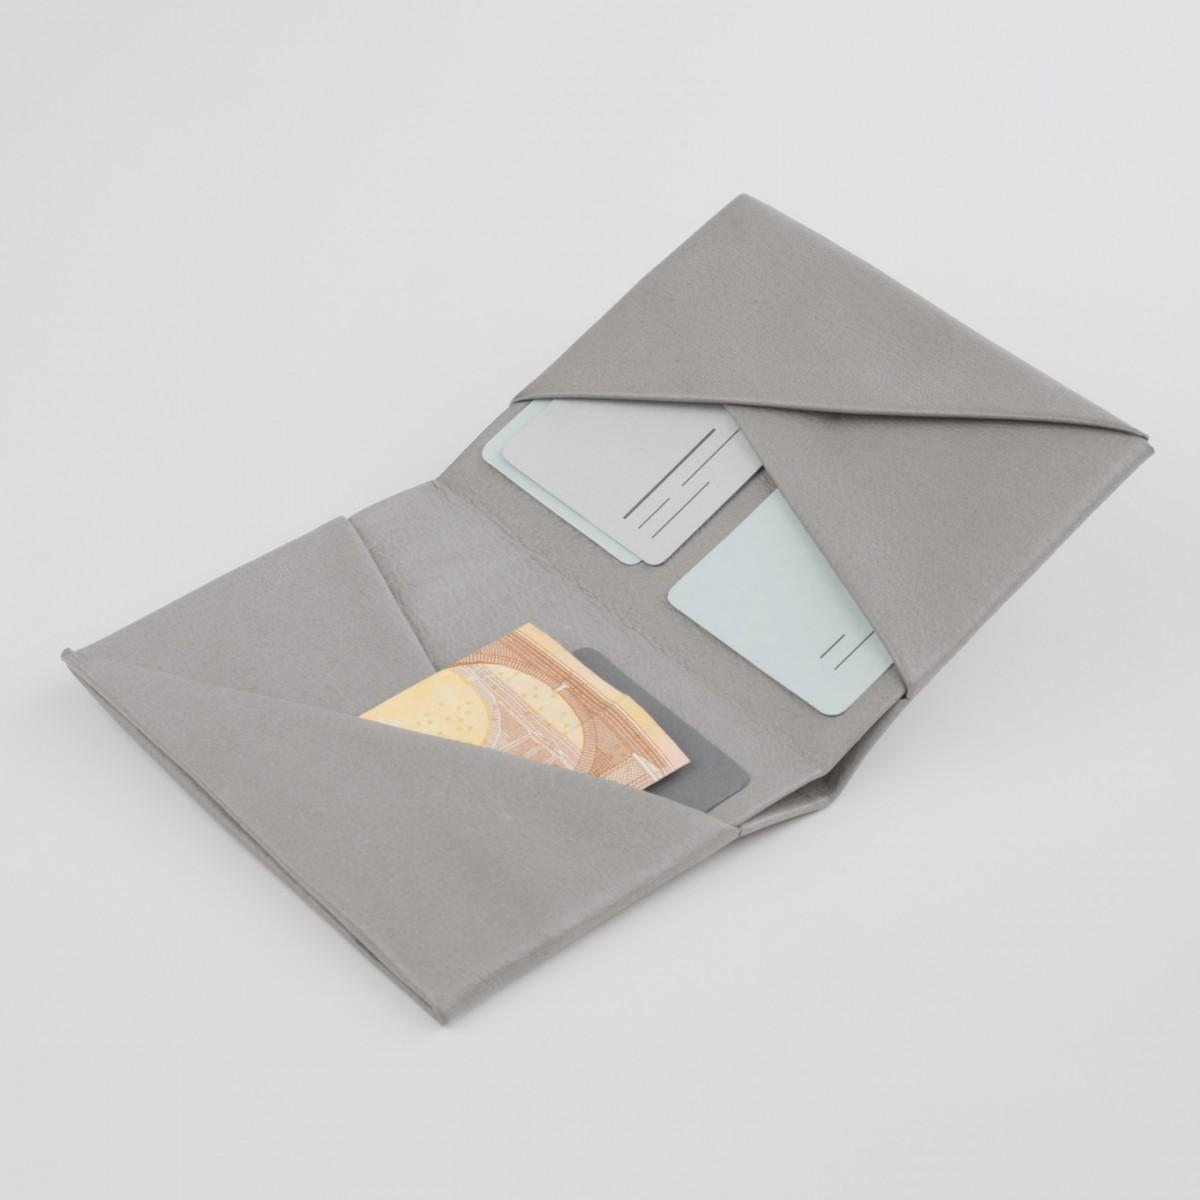 VANOOK Bi-Fold Card Case Large / Stone